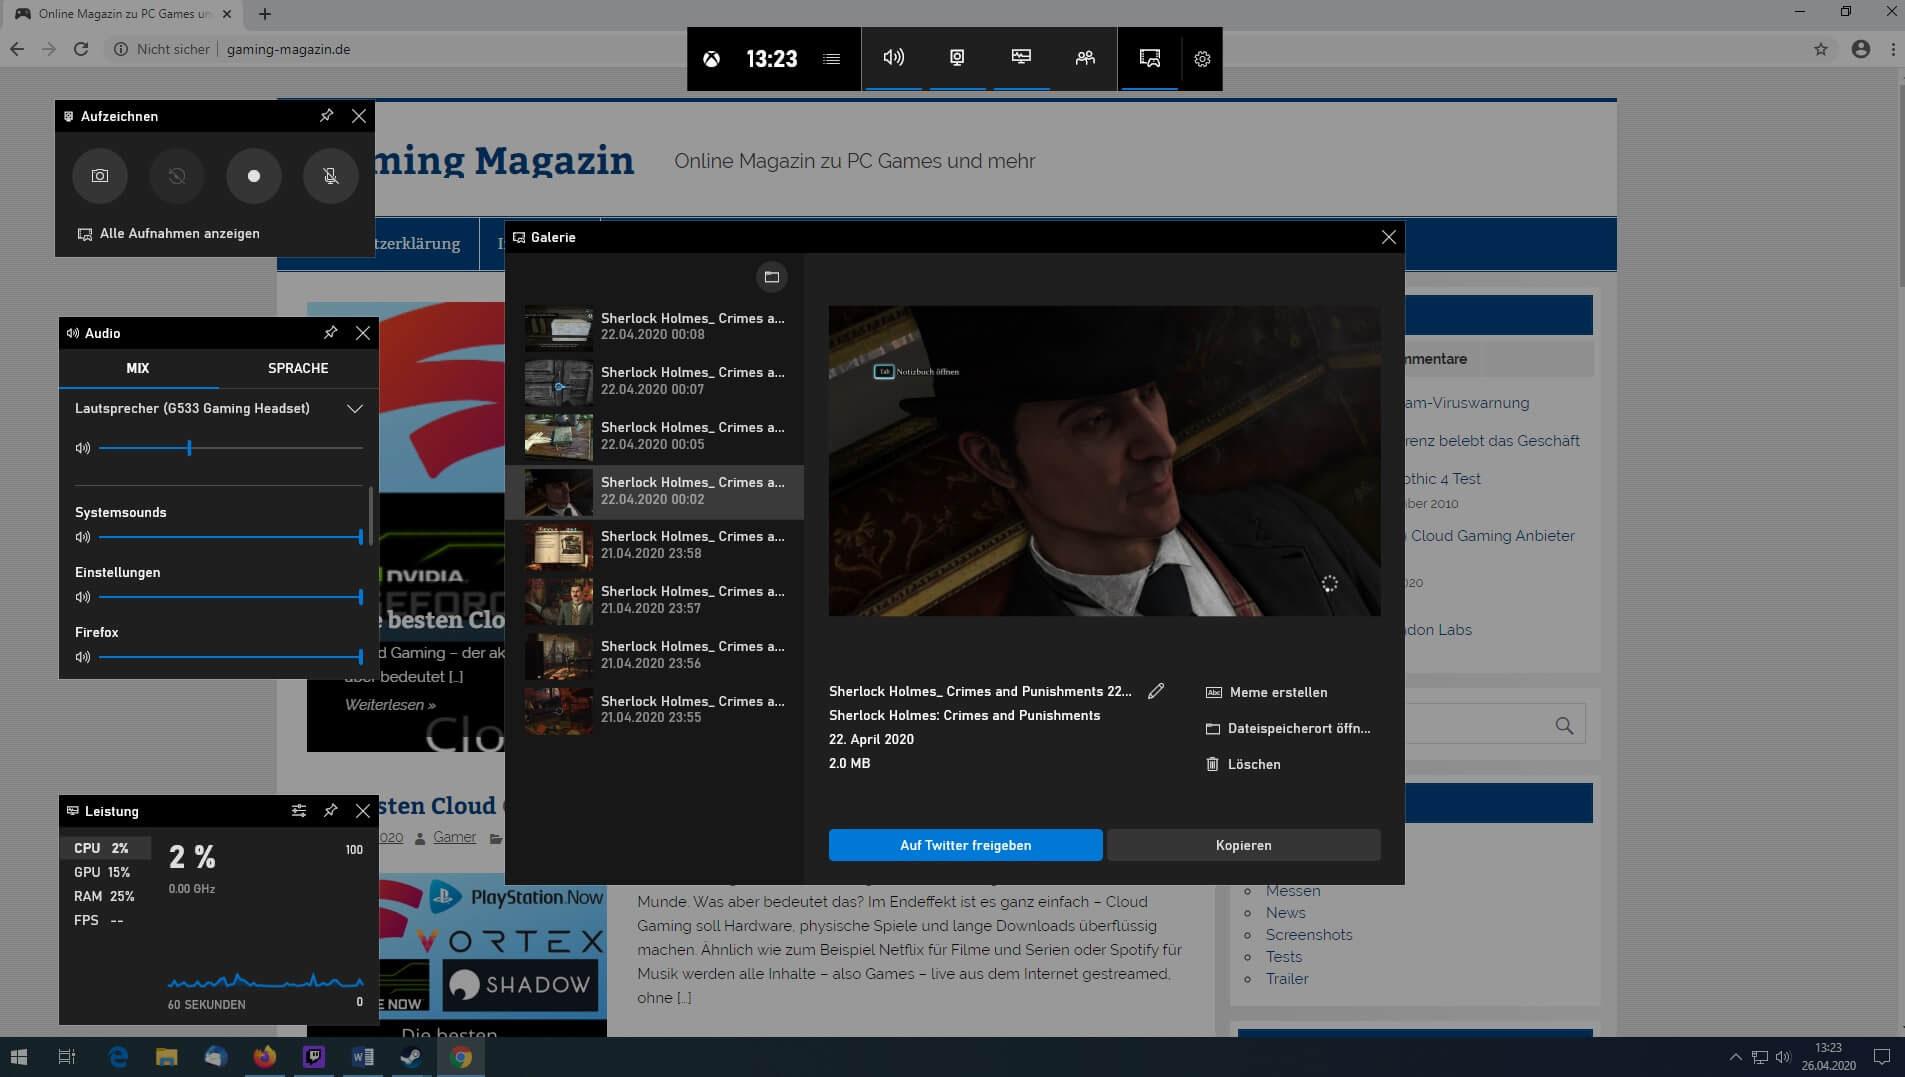 [View 10+] Download Bildschirmfoto Machen Windows Gif PNG